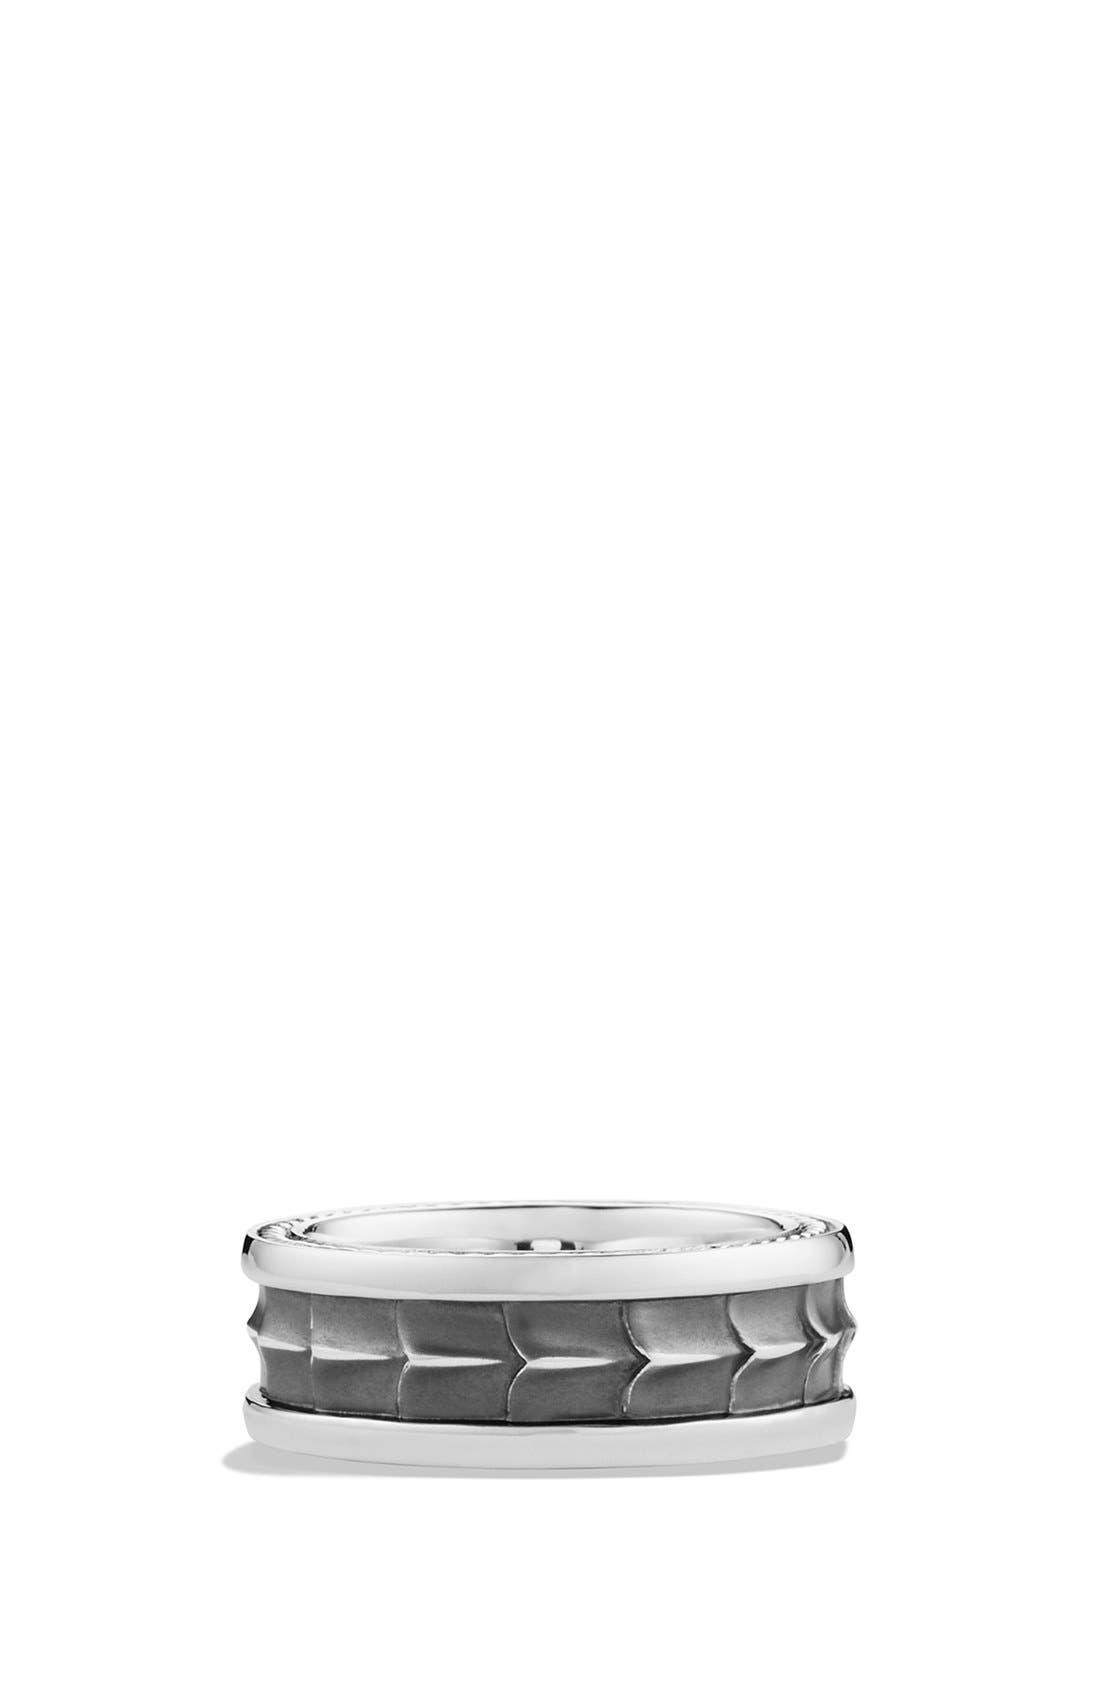 David Yurman 'Armory' Band Ring